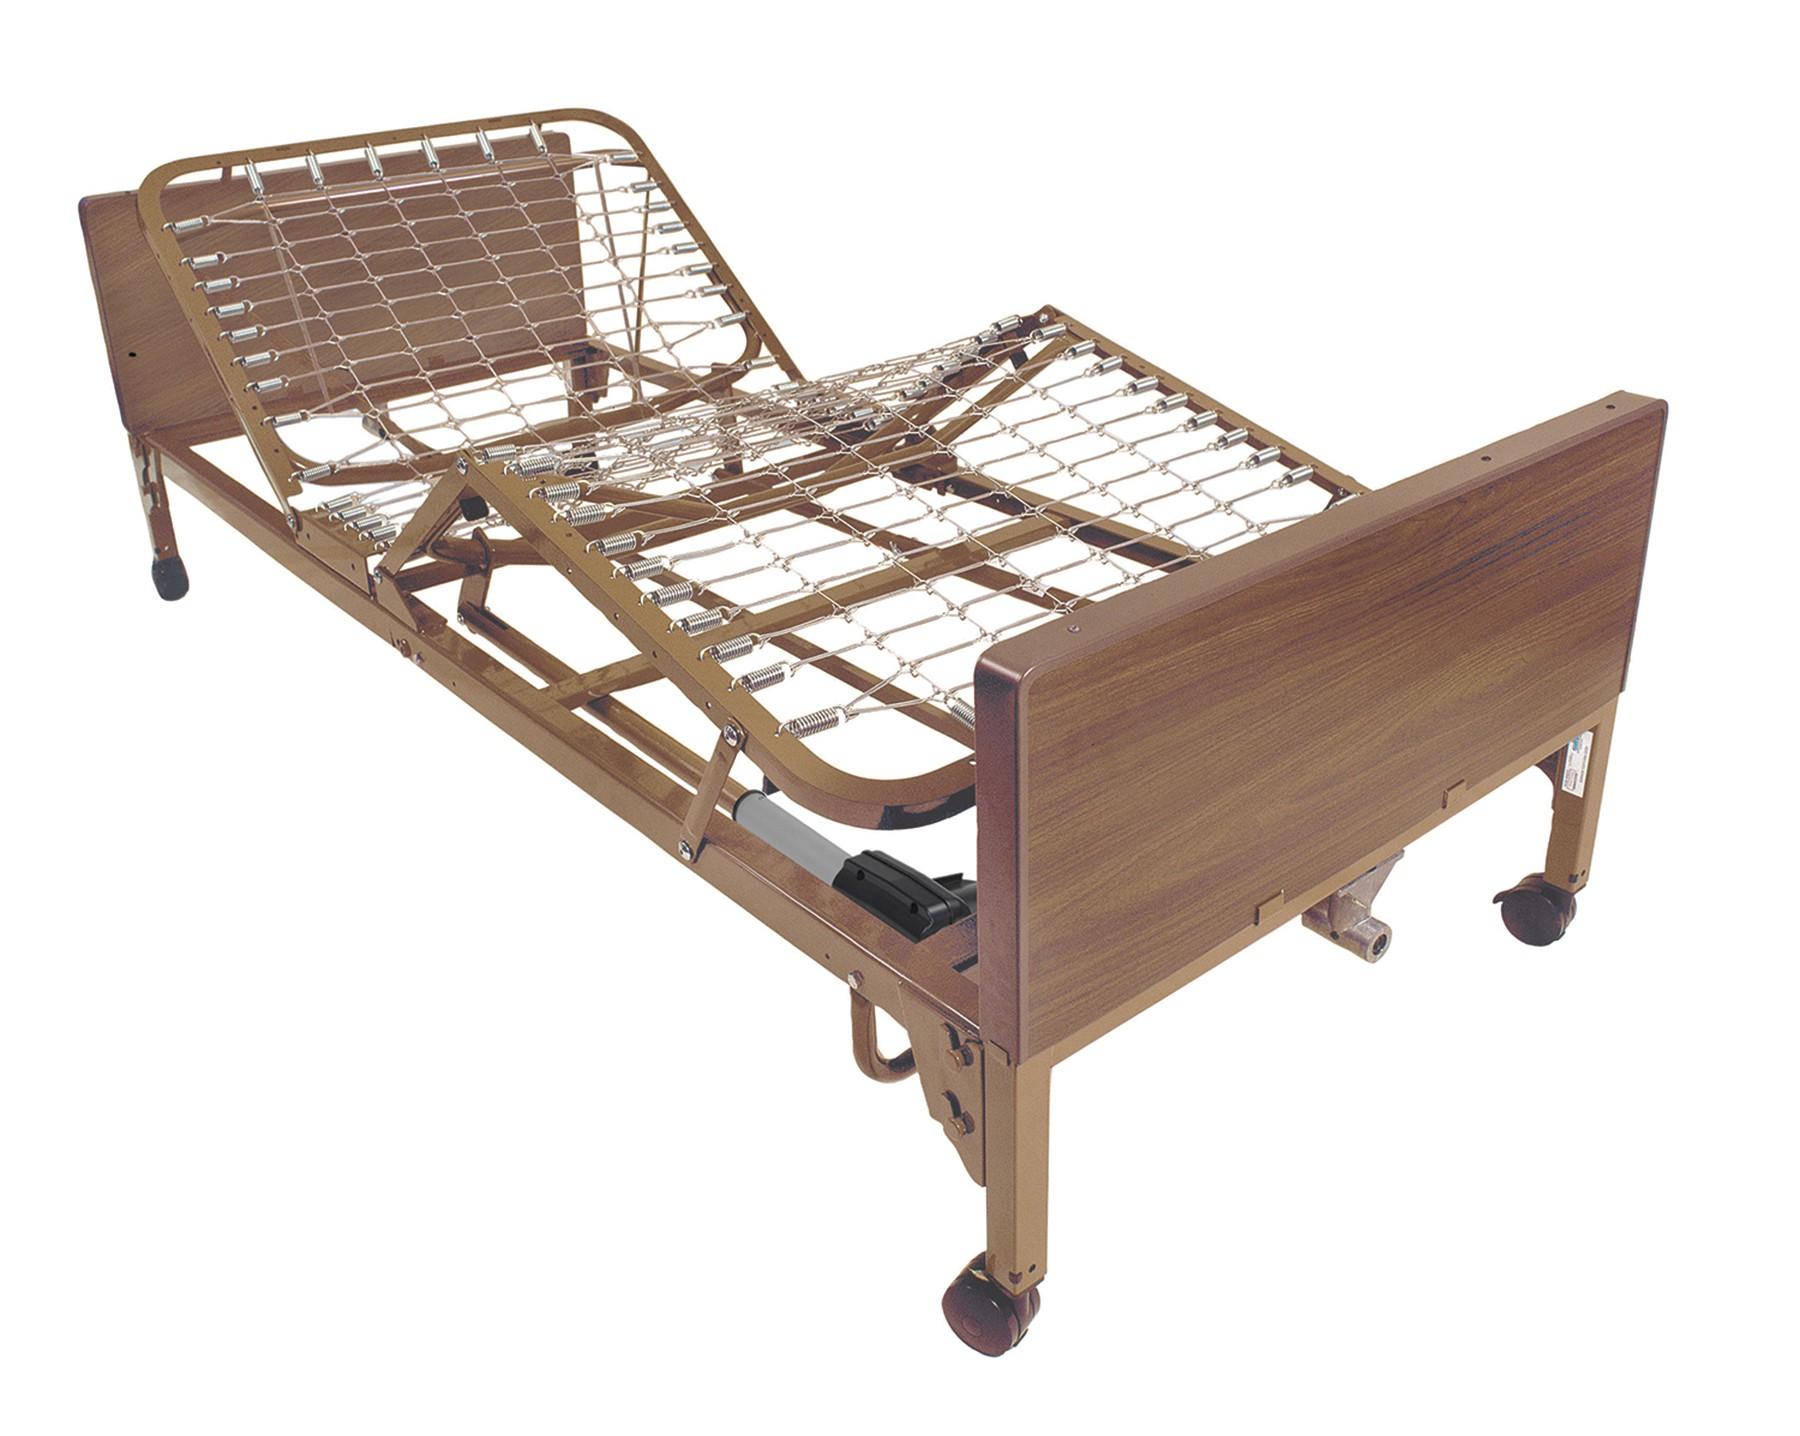 walgreens lift chairs electric chair design theory electropedic phoenix az adjustable beds